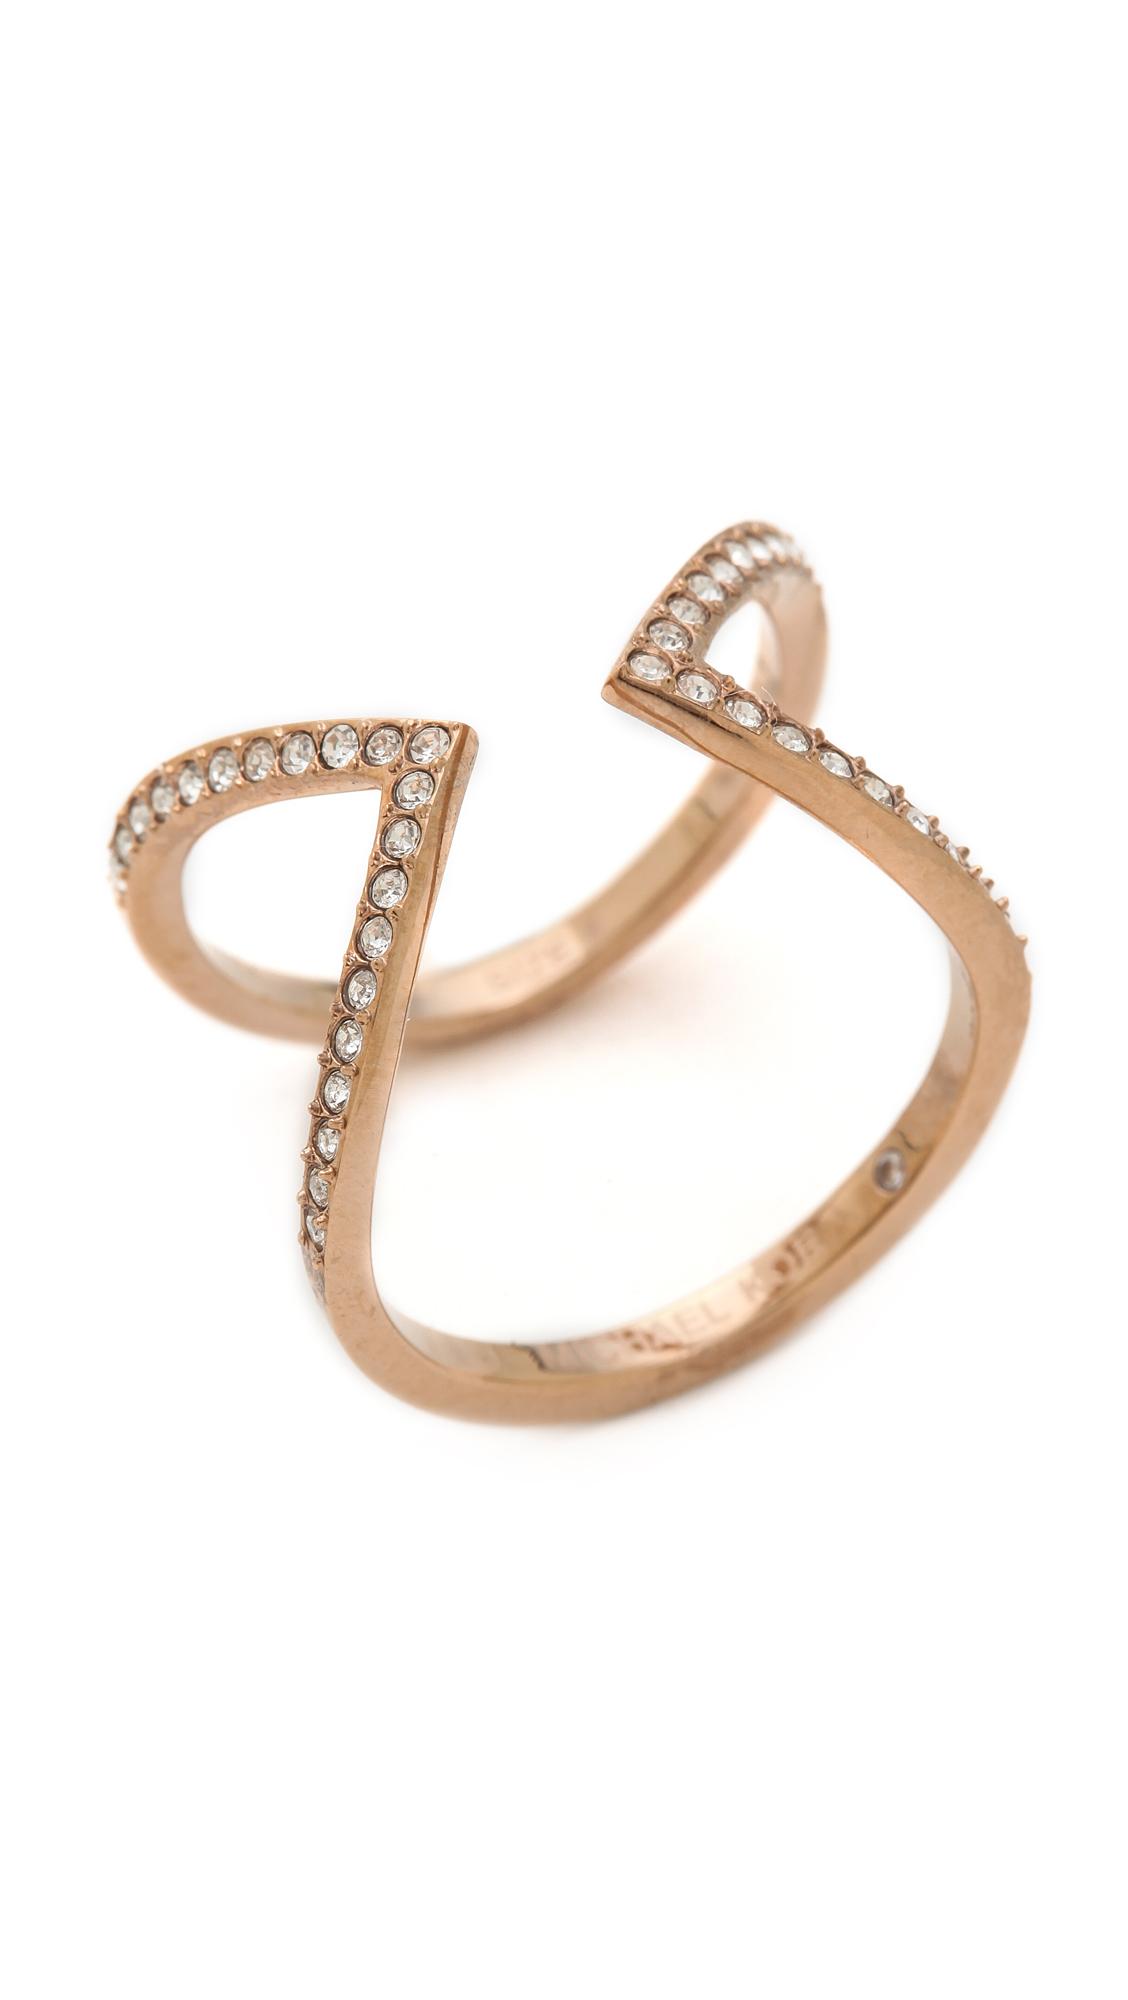 Michael Kors Open Delicate Arrow Ring Rose Goldclear in Metallic